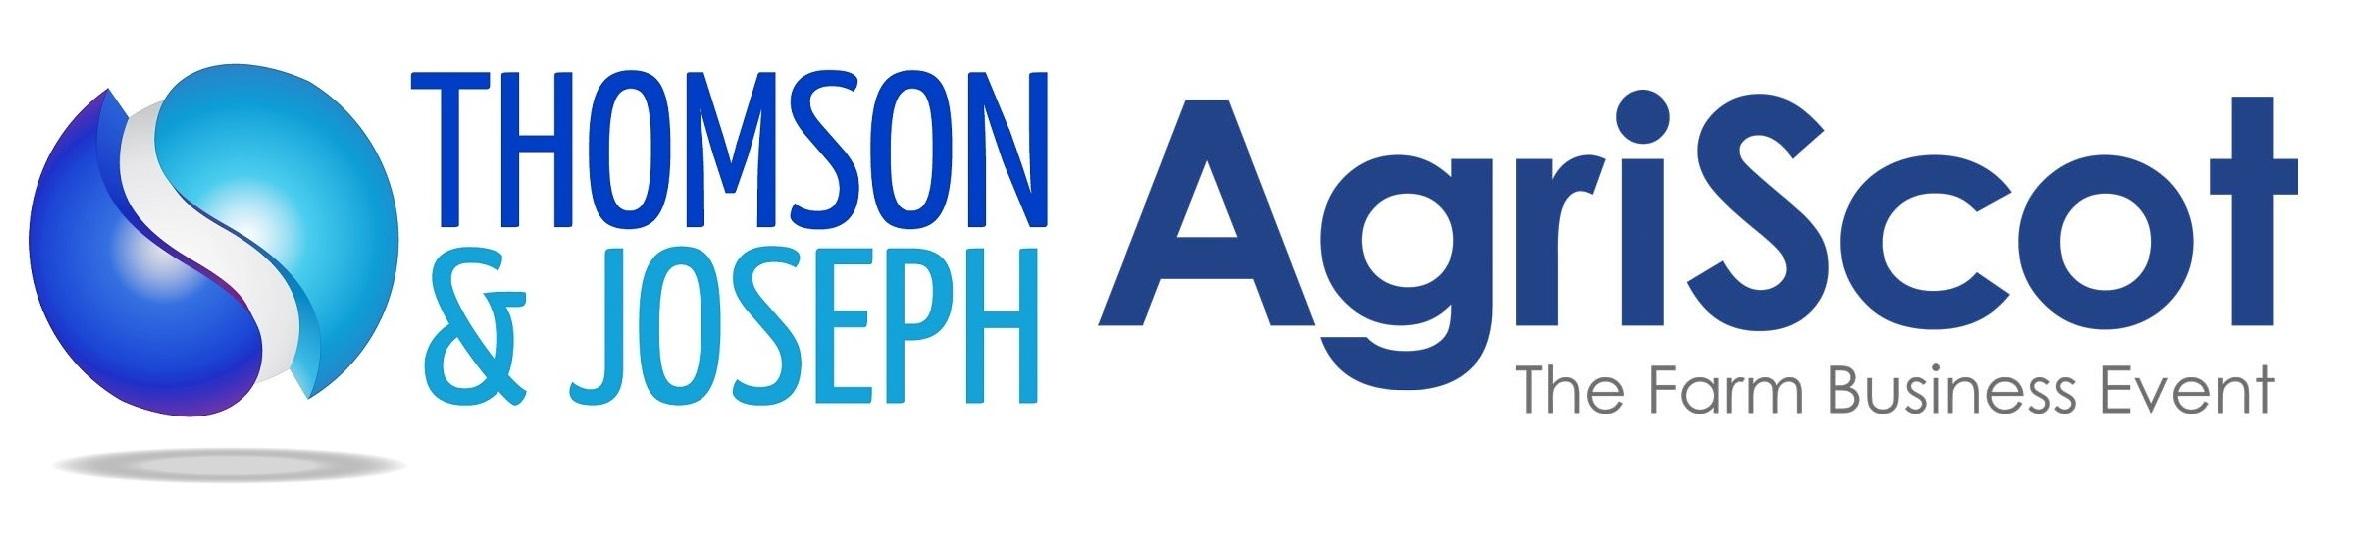 Thomson & Joseph AgriScot